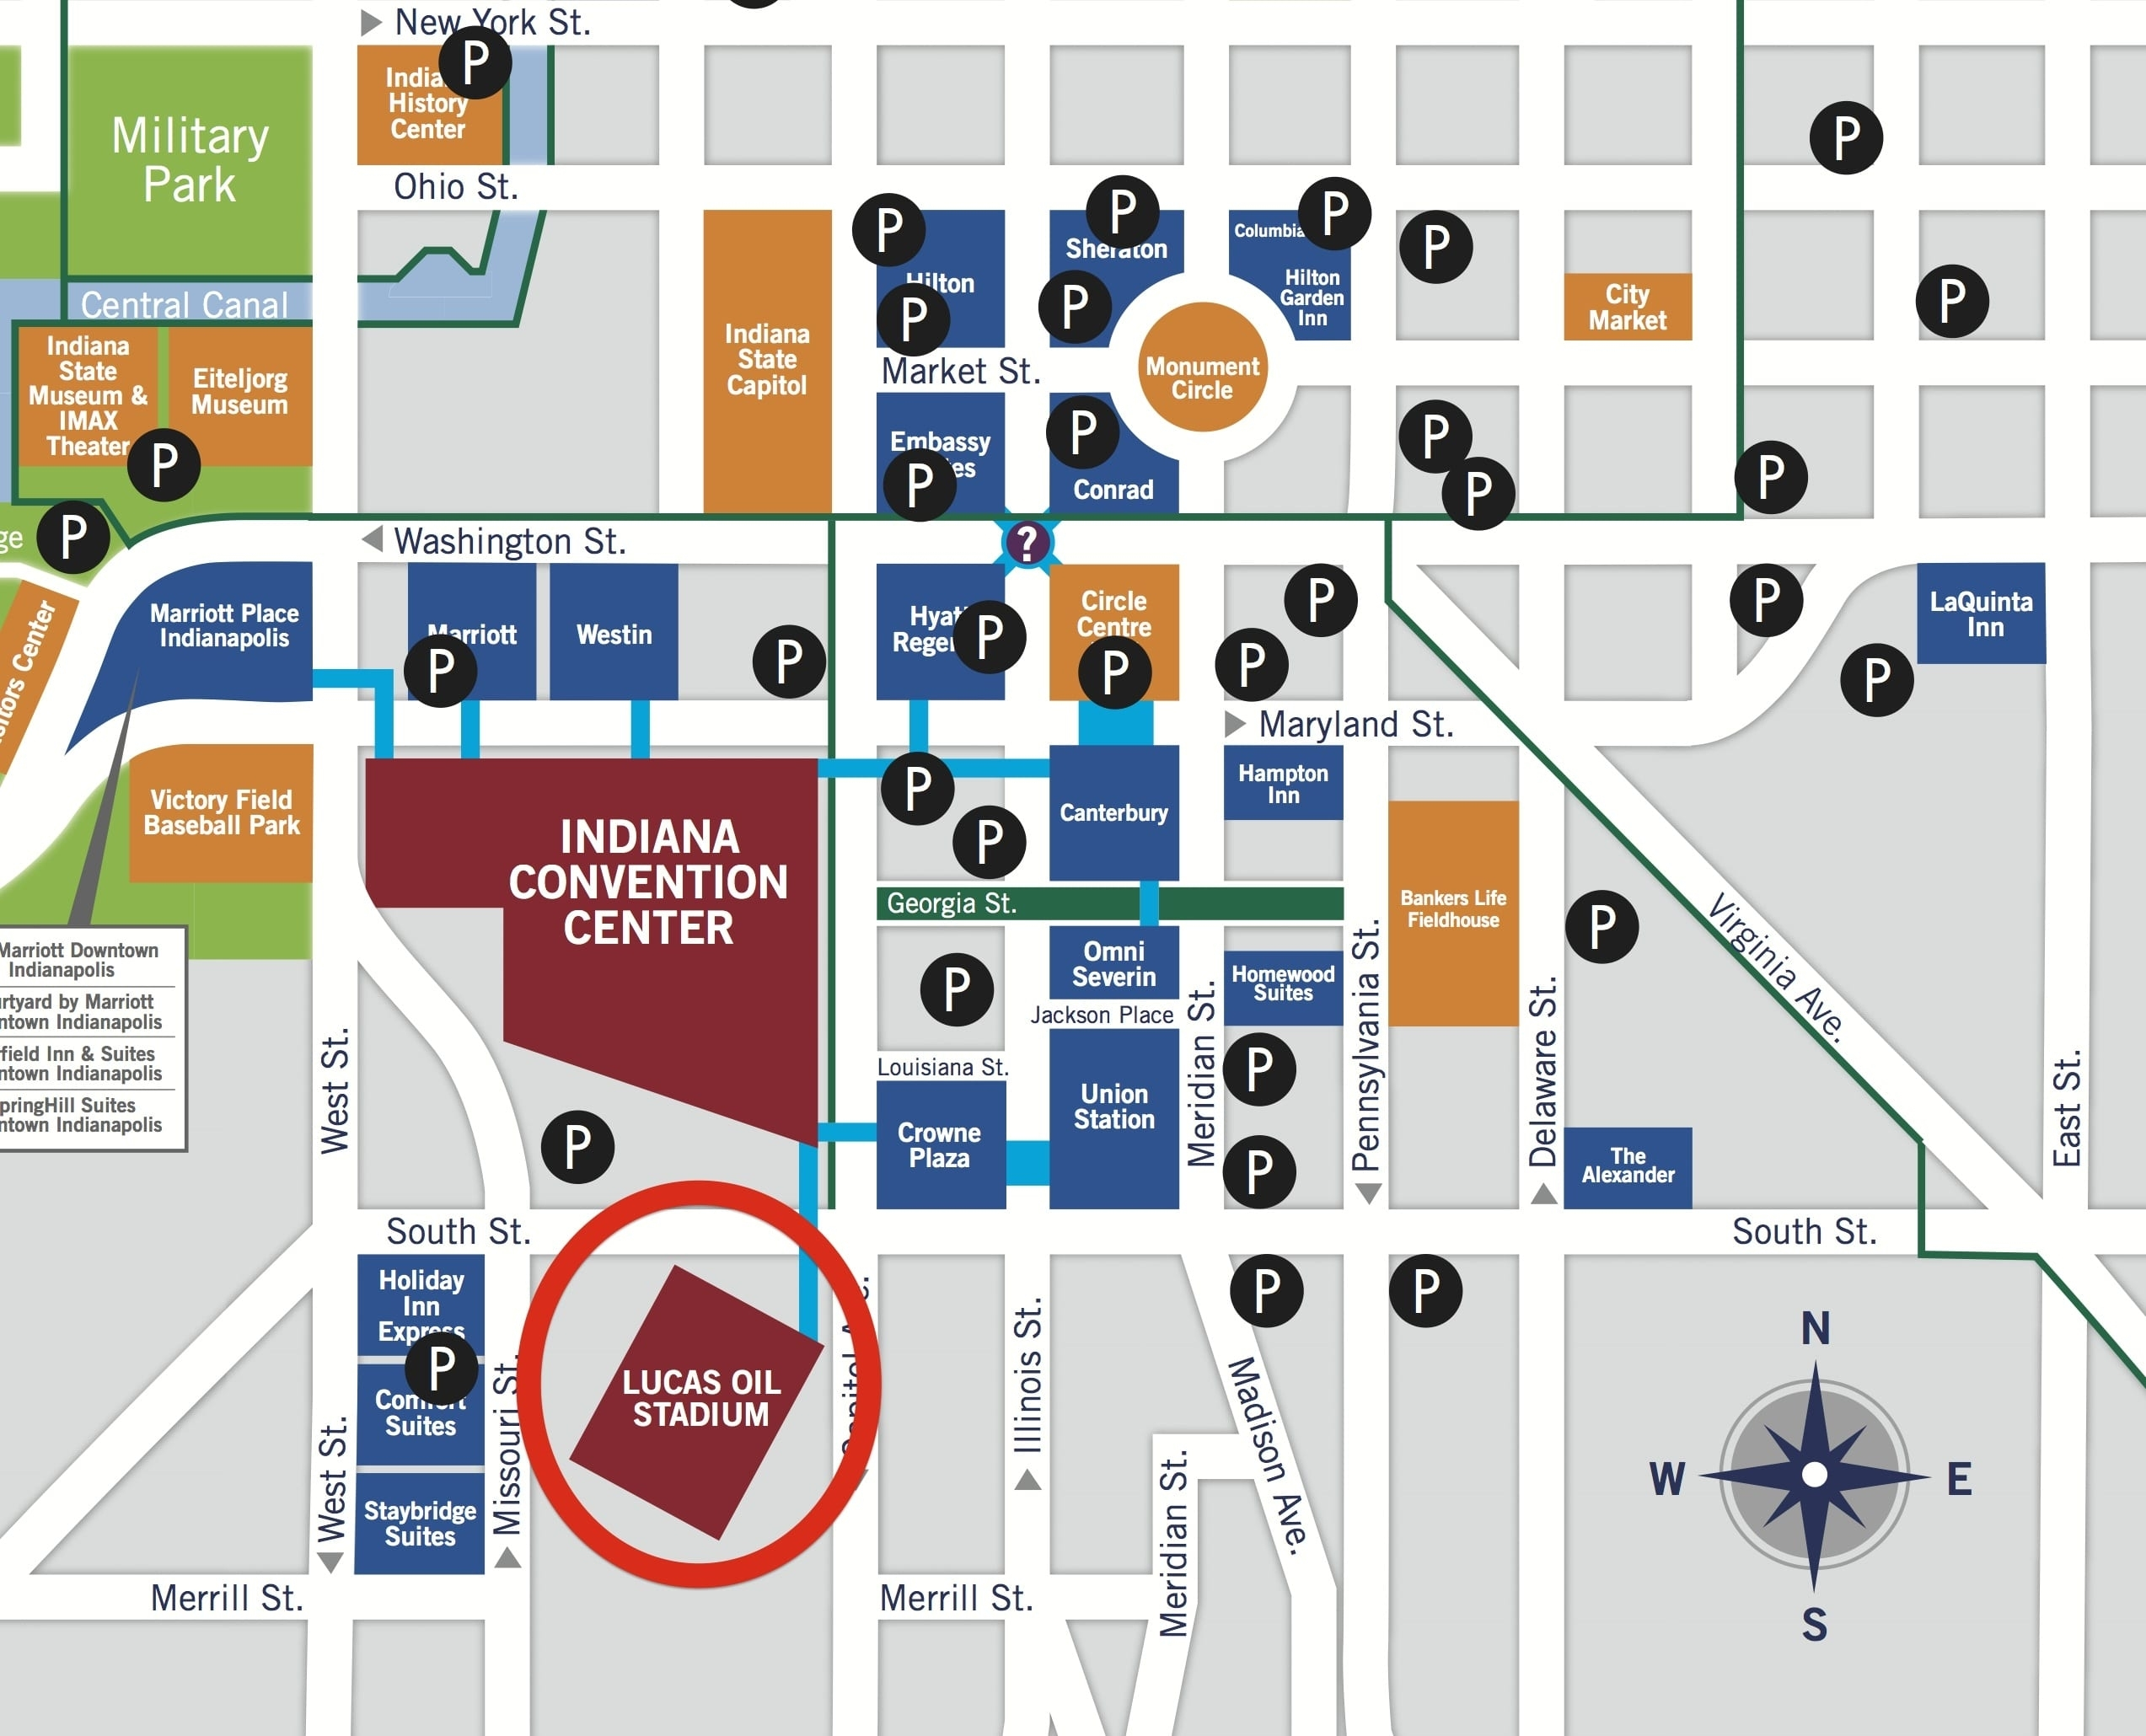 Lucas Oil Stadium Parking Guide: Prices, Maps, Deals   Spg for Super Bowl Parking Map